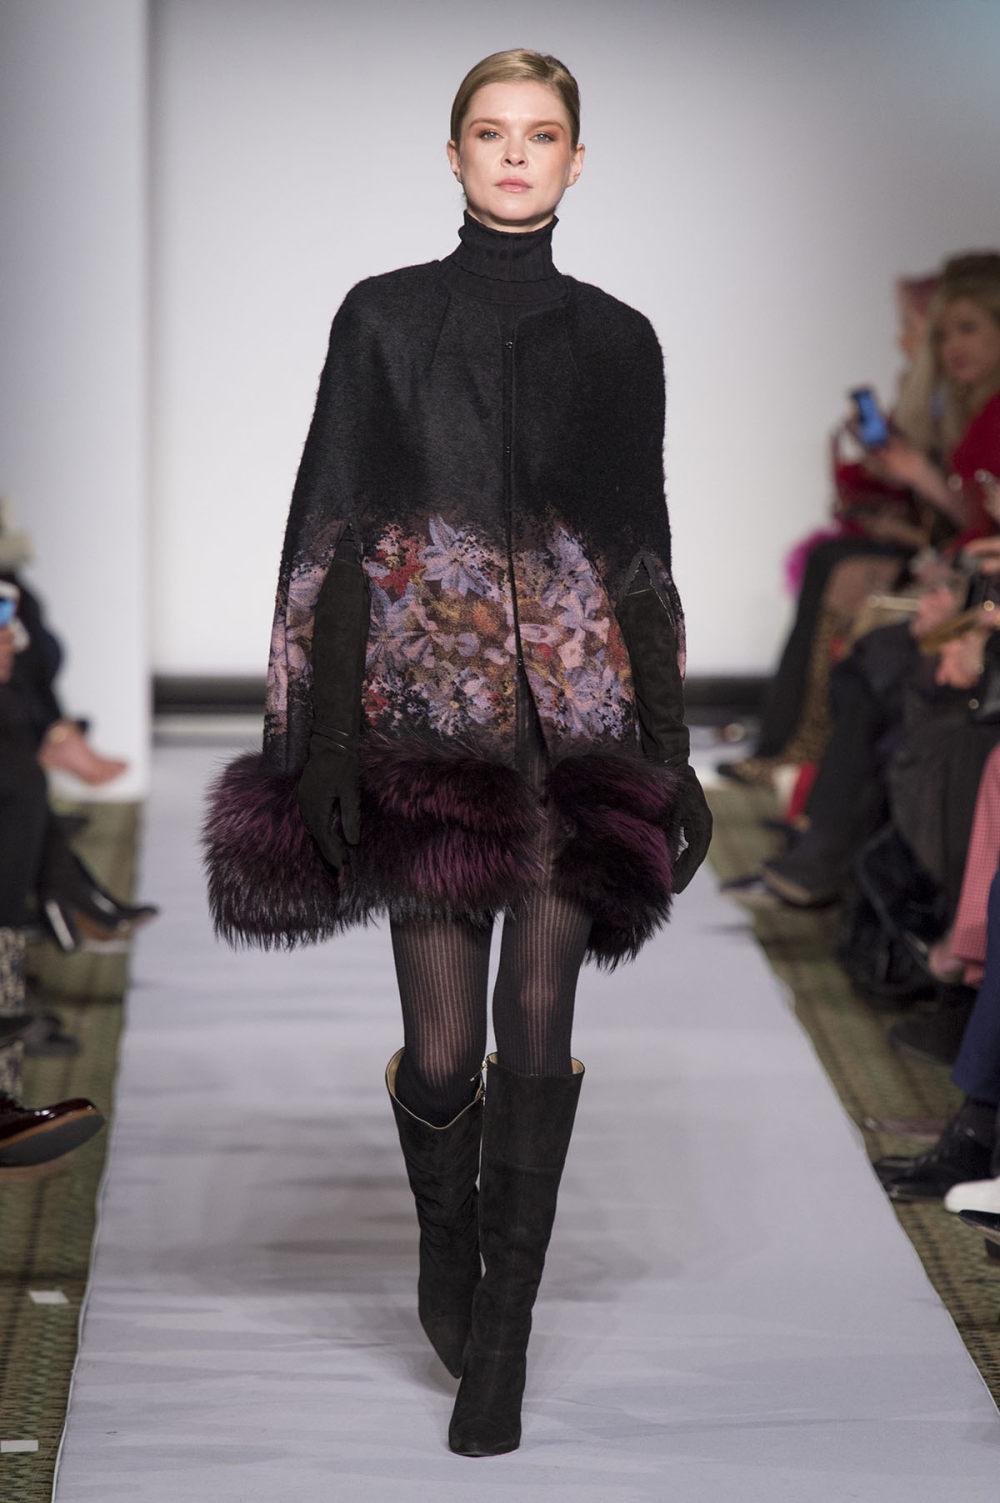 Carolina Herrera时装系列用鲜艳的颜色充满智能的黑白色调-28.jpg